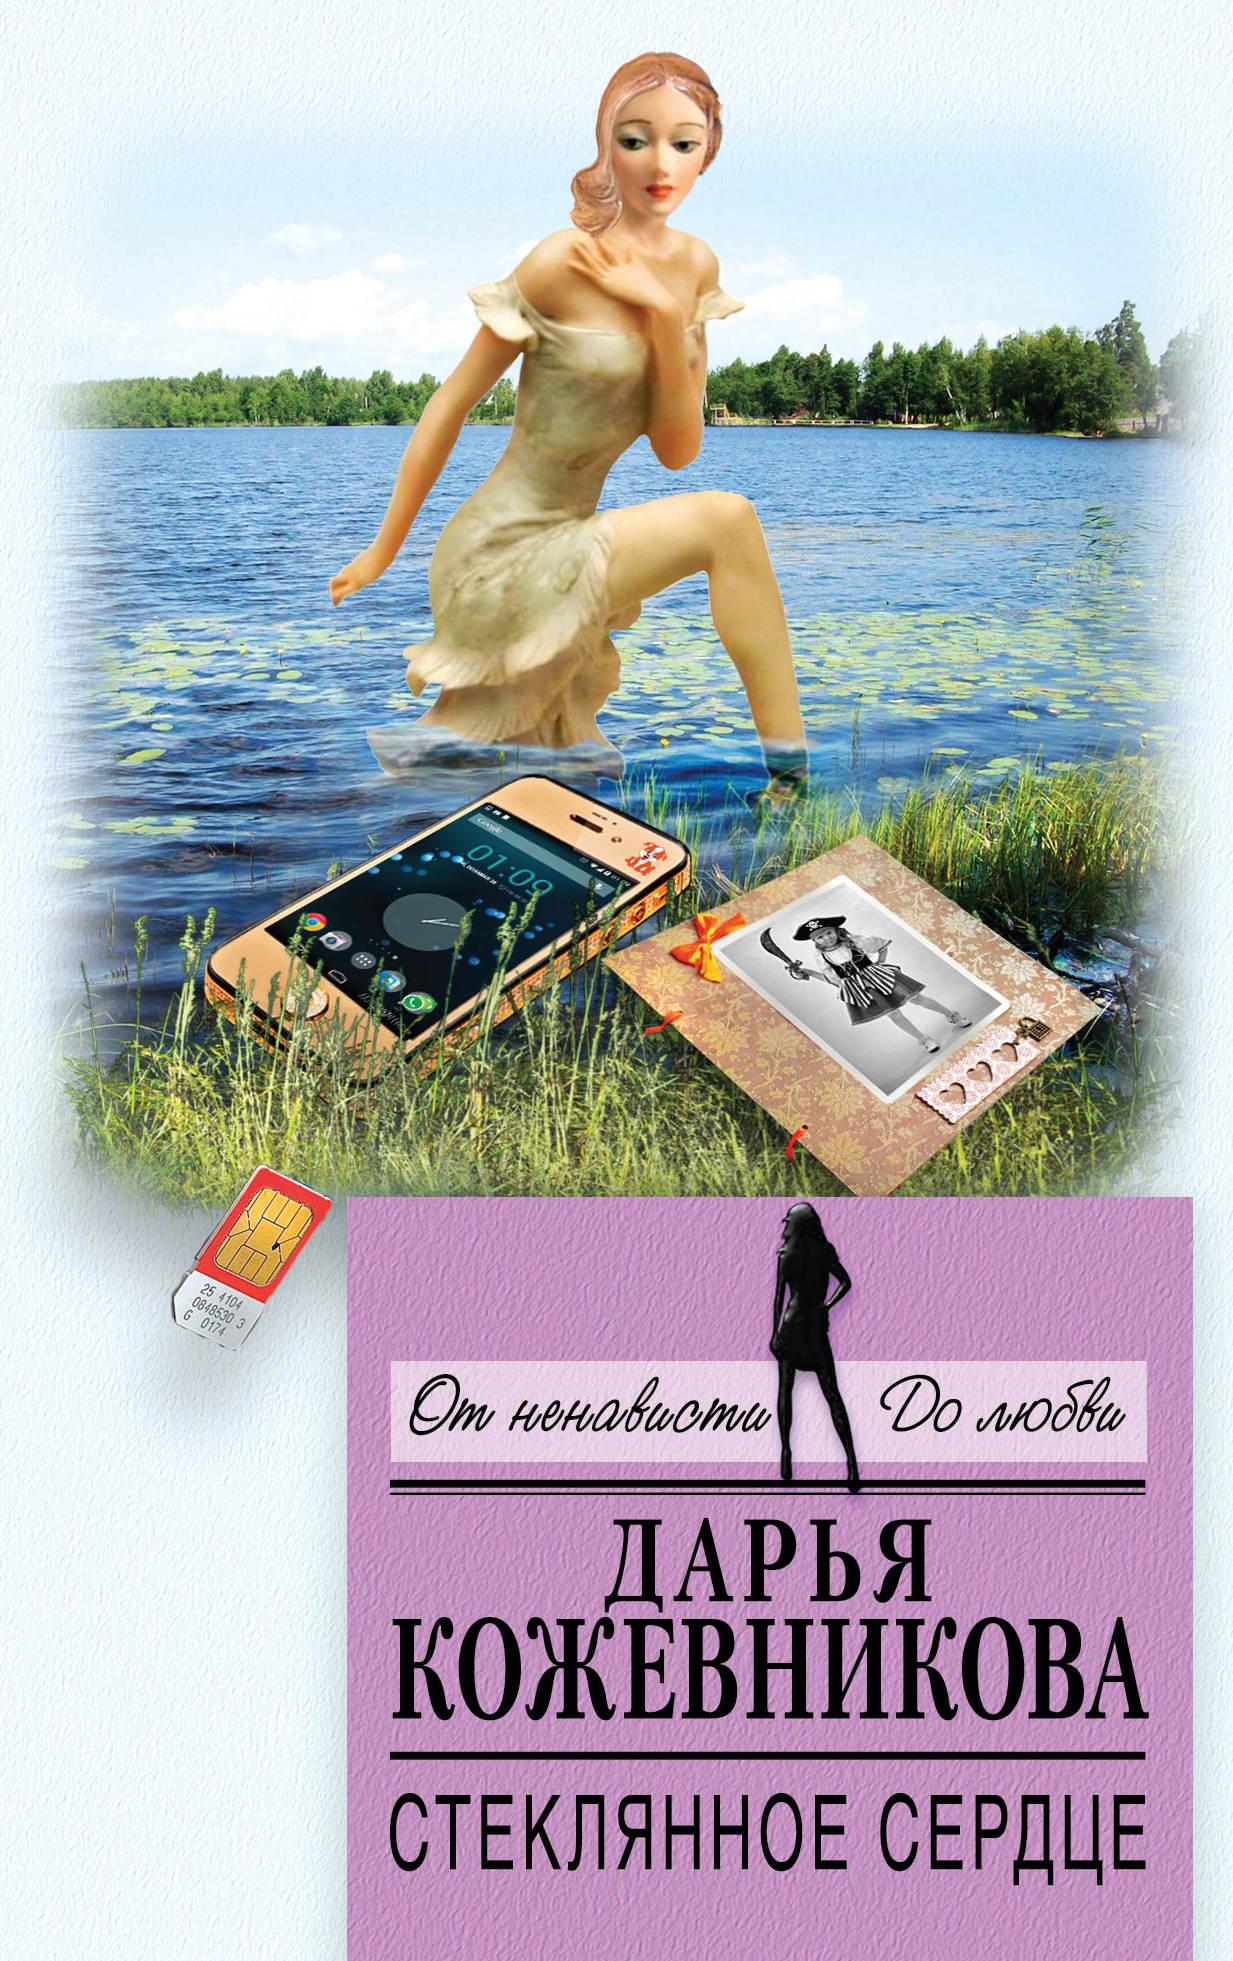 все цены на Дарья Кожевникова Стеклянное сердце онлайн